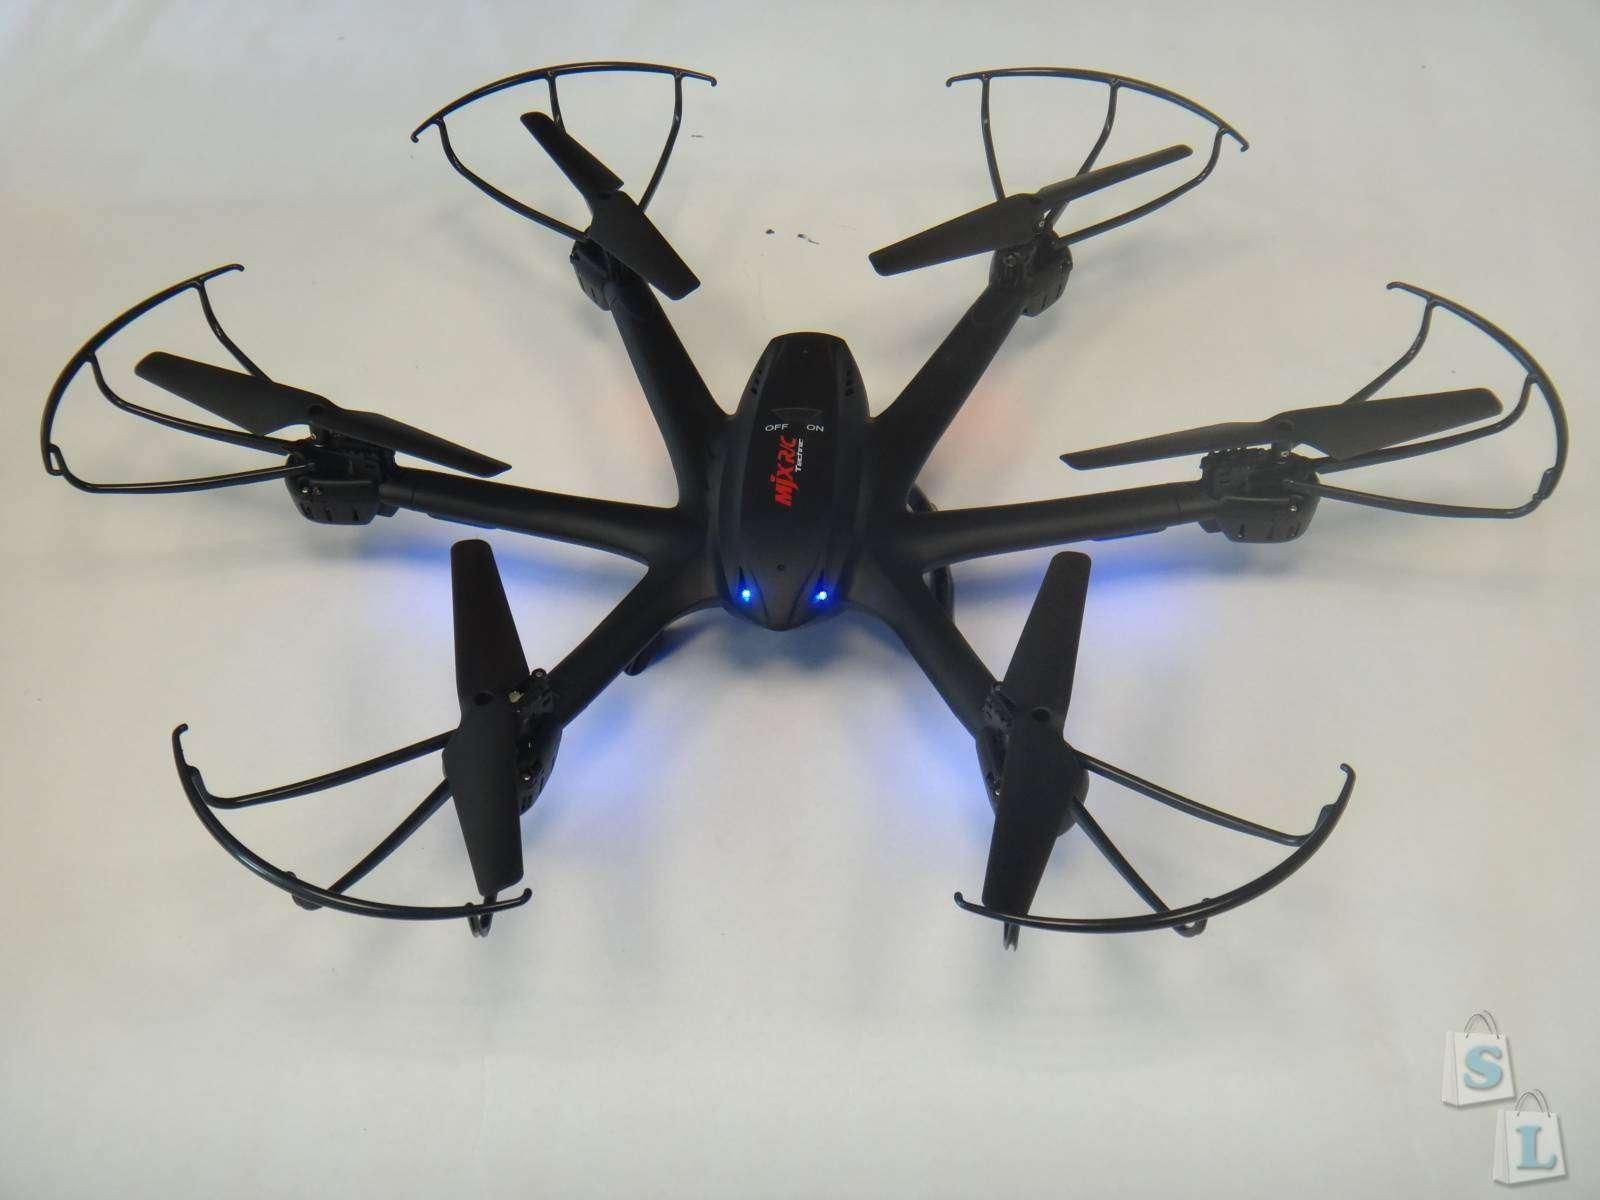 Обзор гексакоптера MJX X600 2.4G 4CH RC Drone Hexacopter 6-axis Gyro